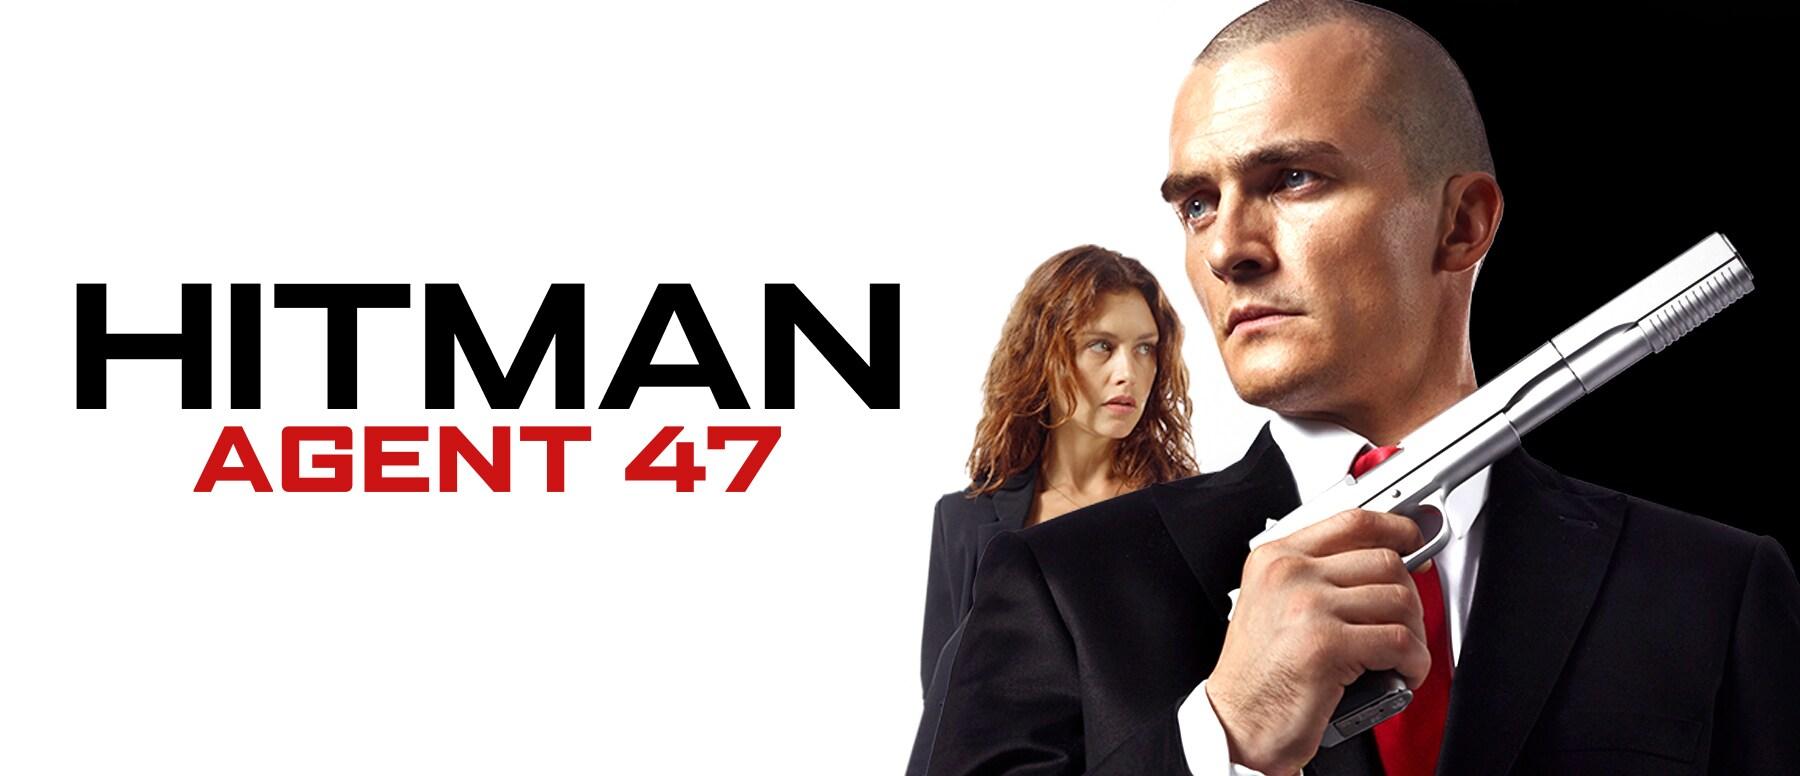 hitman movie cast 2015